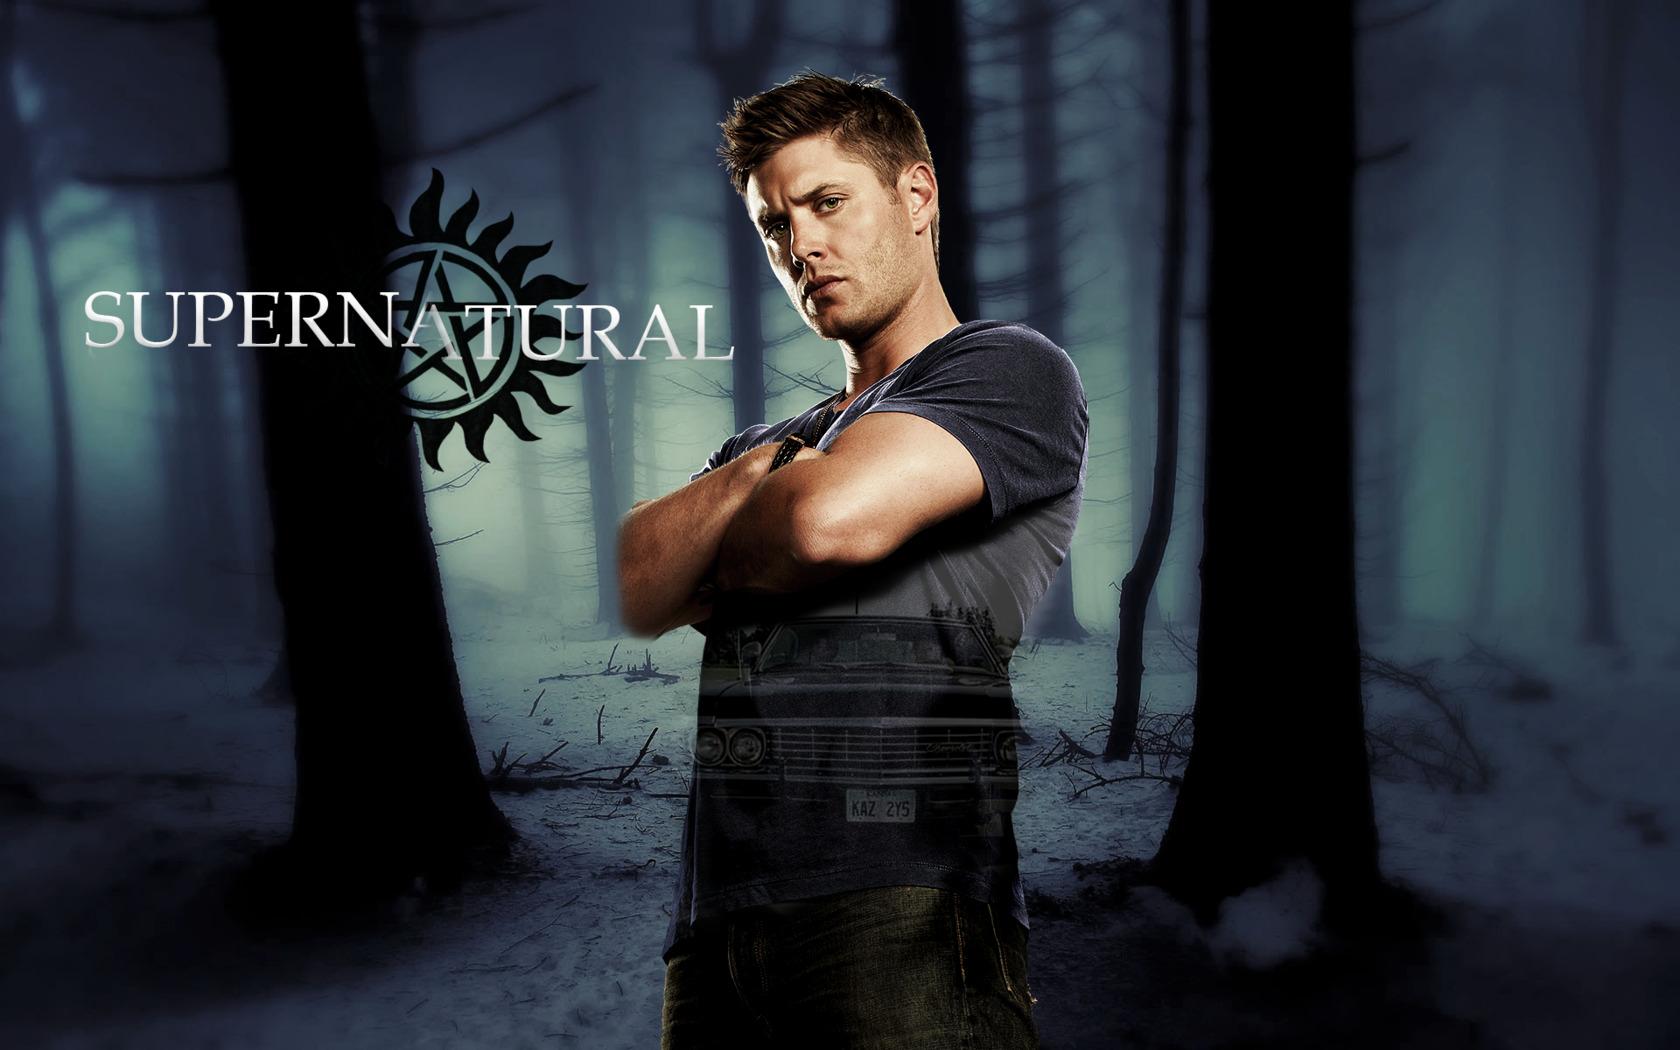 supernatural-tv-series.jpg